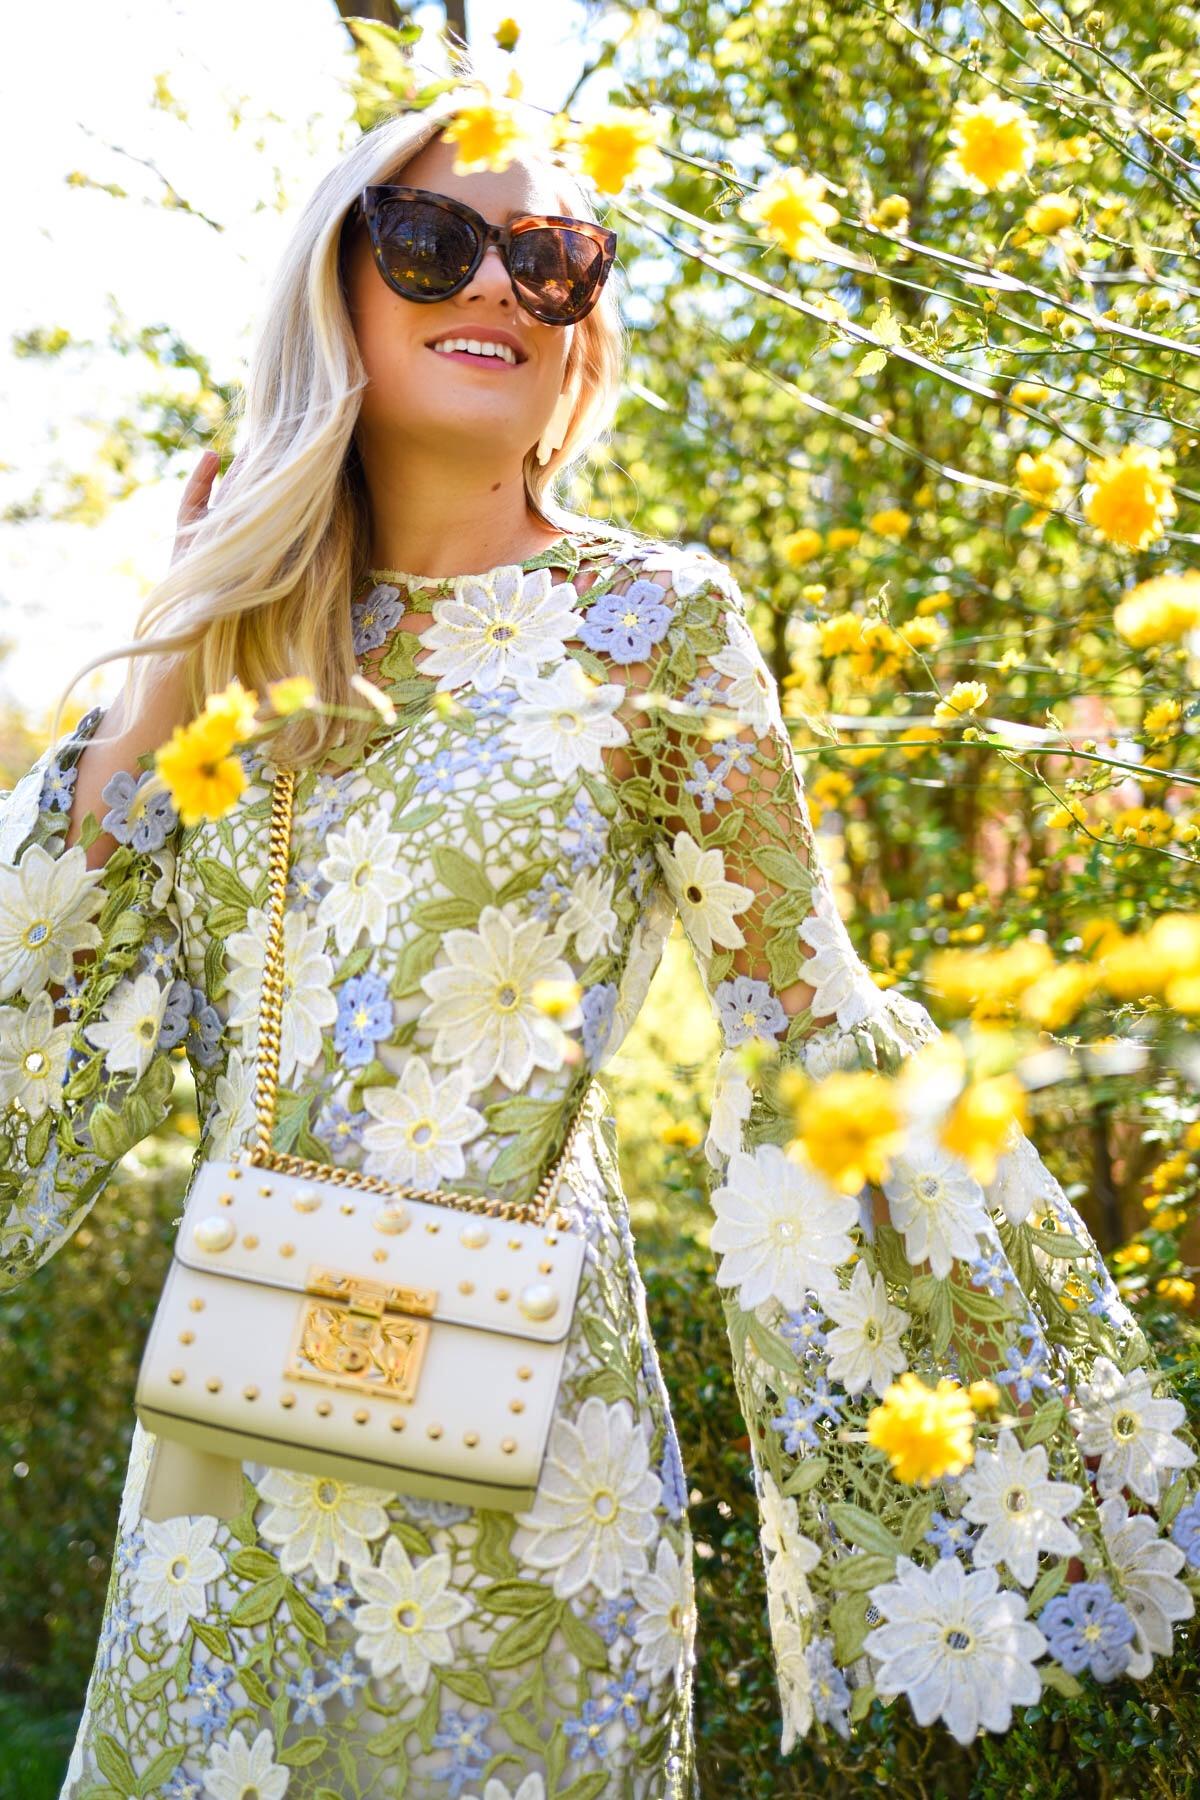 Floral-dress, spring-dress, gucci-handbag, neiman-marcus-handbag